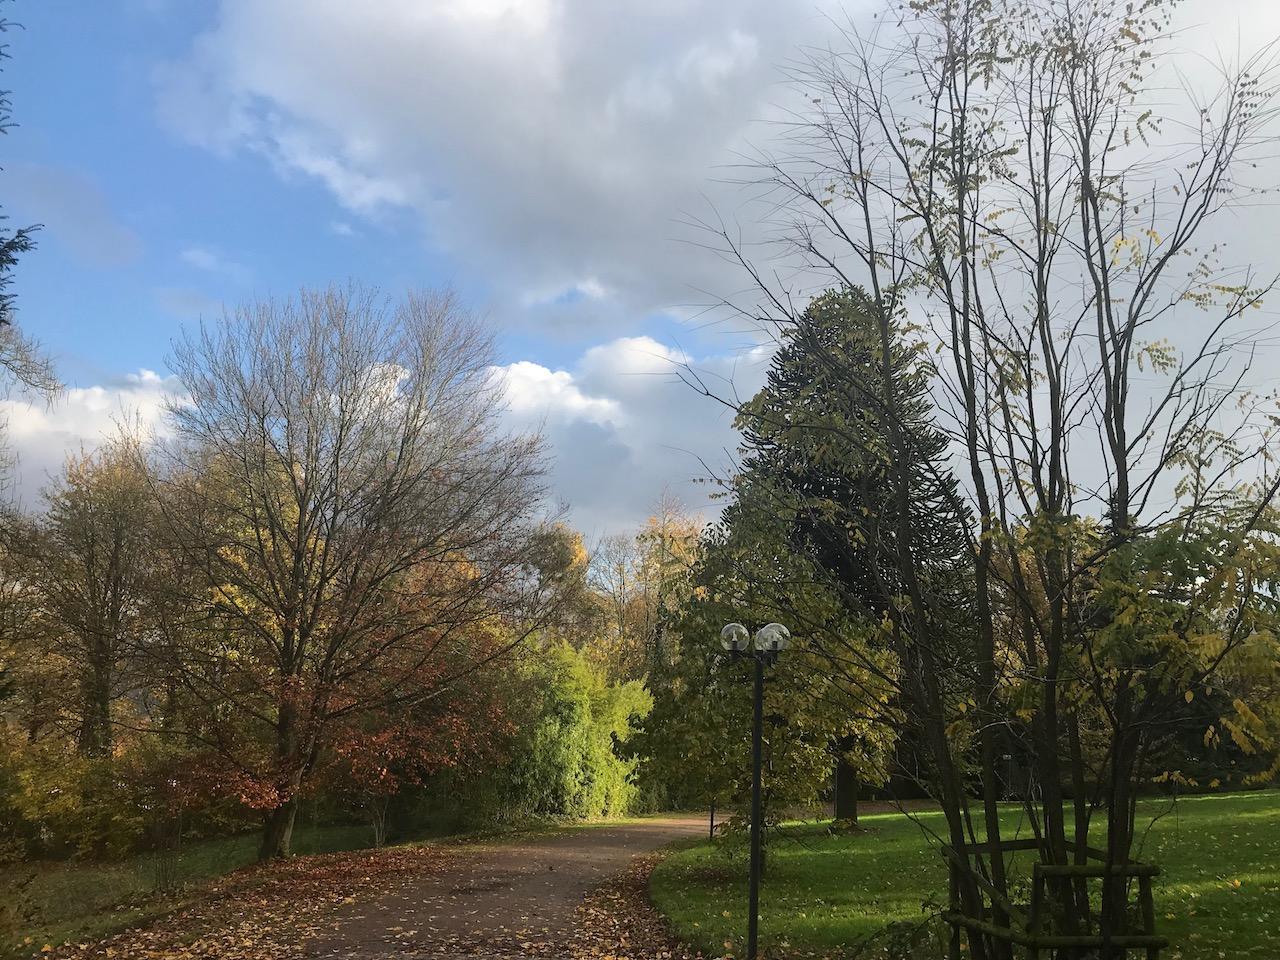 An autumn scene at the Rheinaue, the State park in Bonn, Germany where COP23 was held